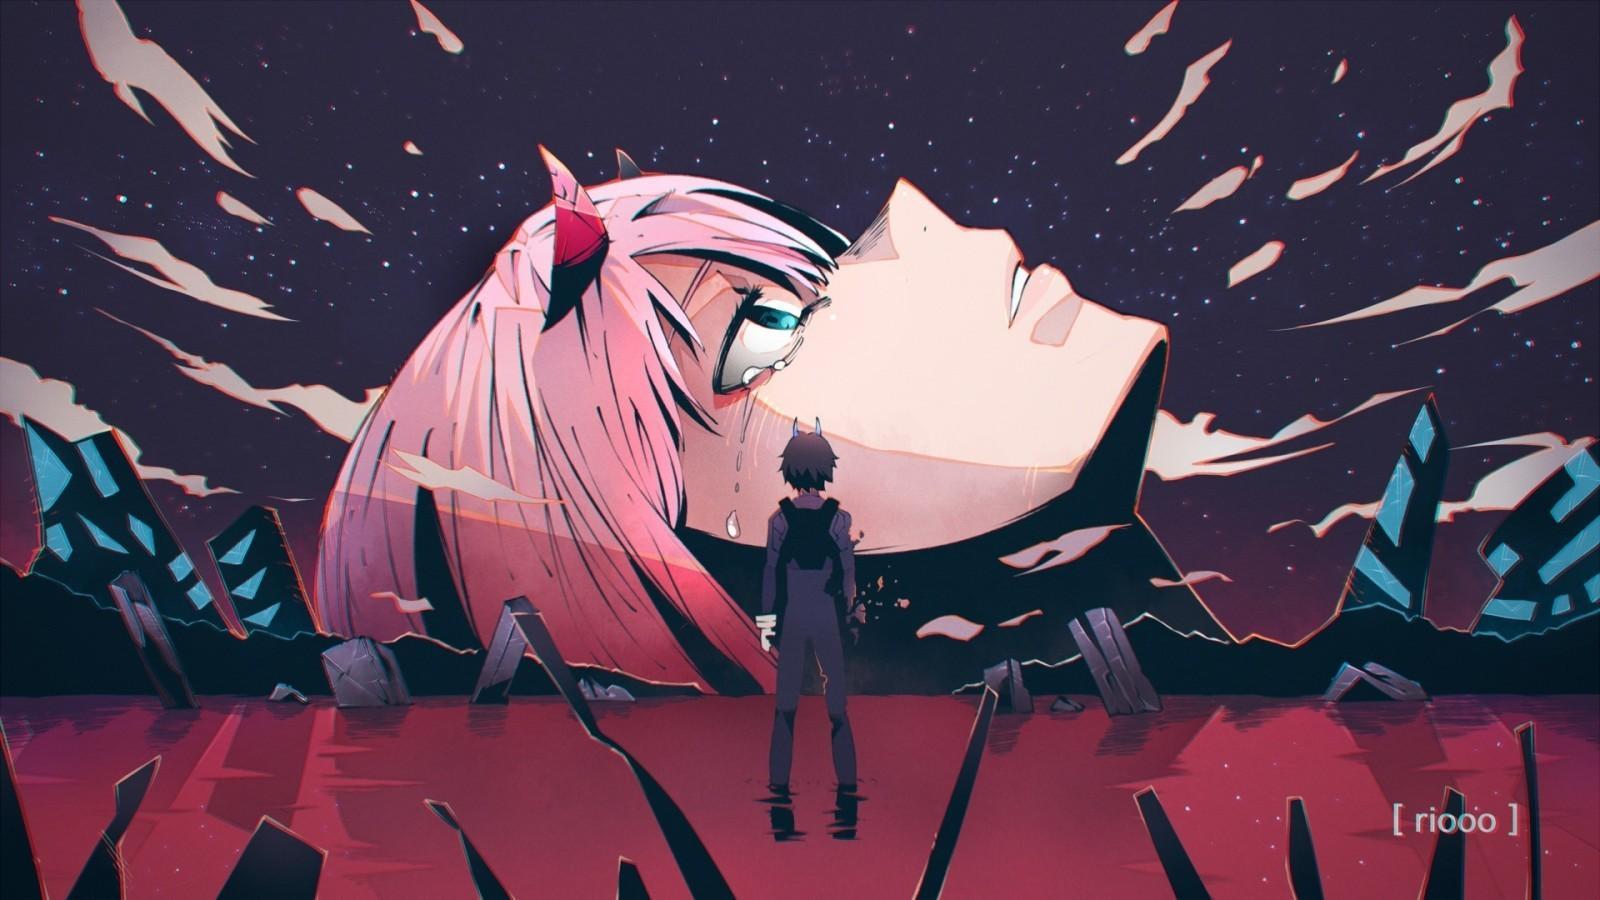 sad anime aesthetic ps4 wallpapers